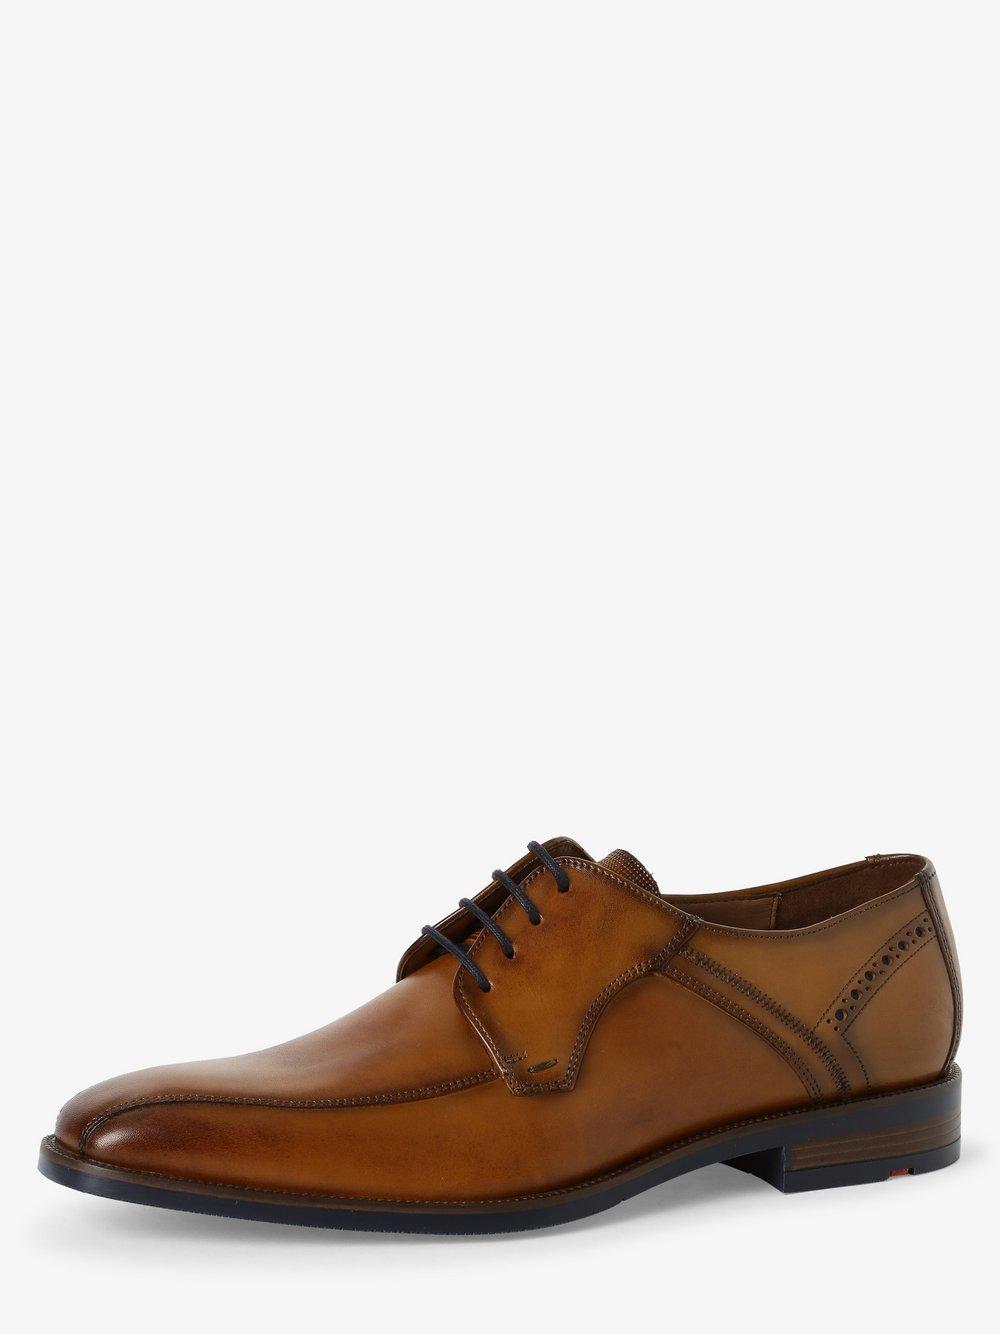 Lloyd – Męskie buty sznurowane ze skóry – Nadir, beżowy Van Graaf 468883-0001